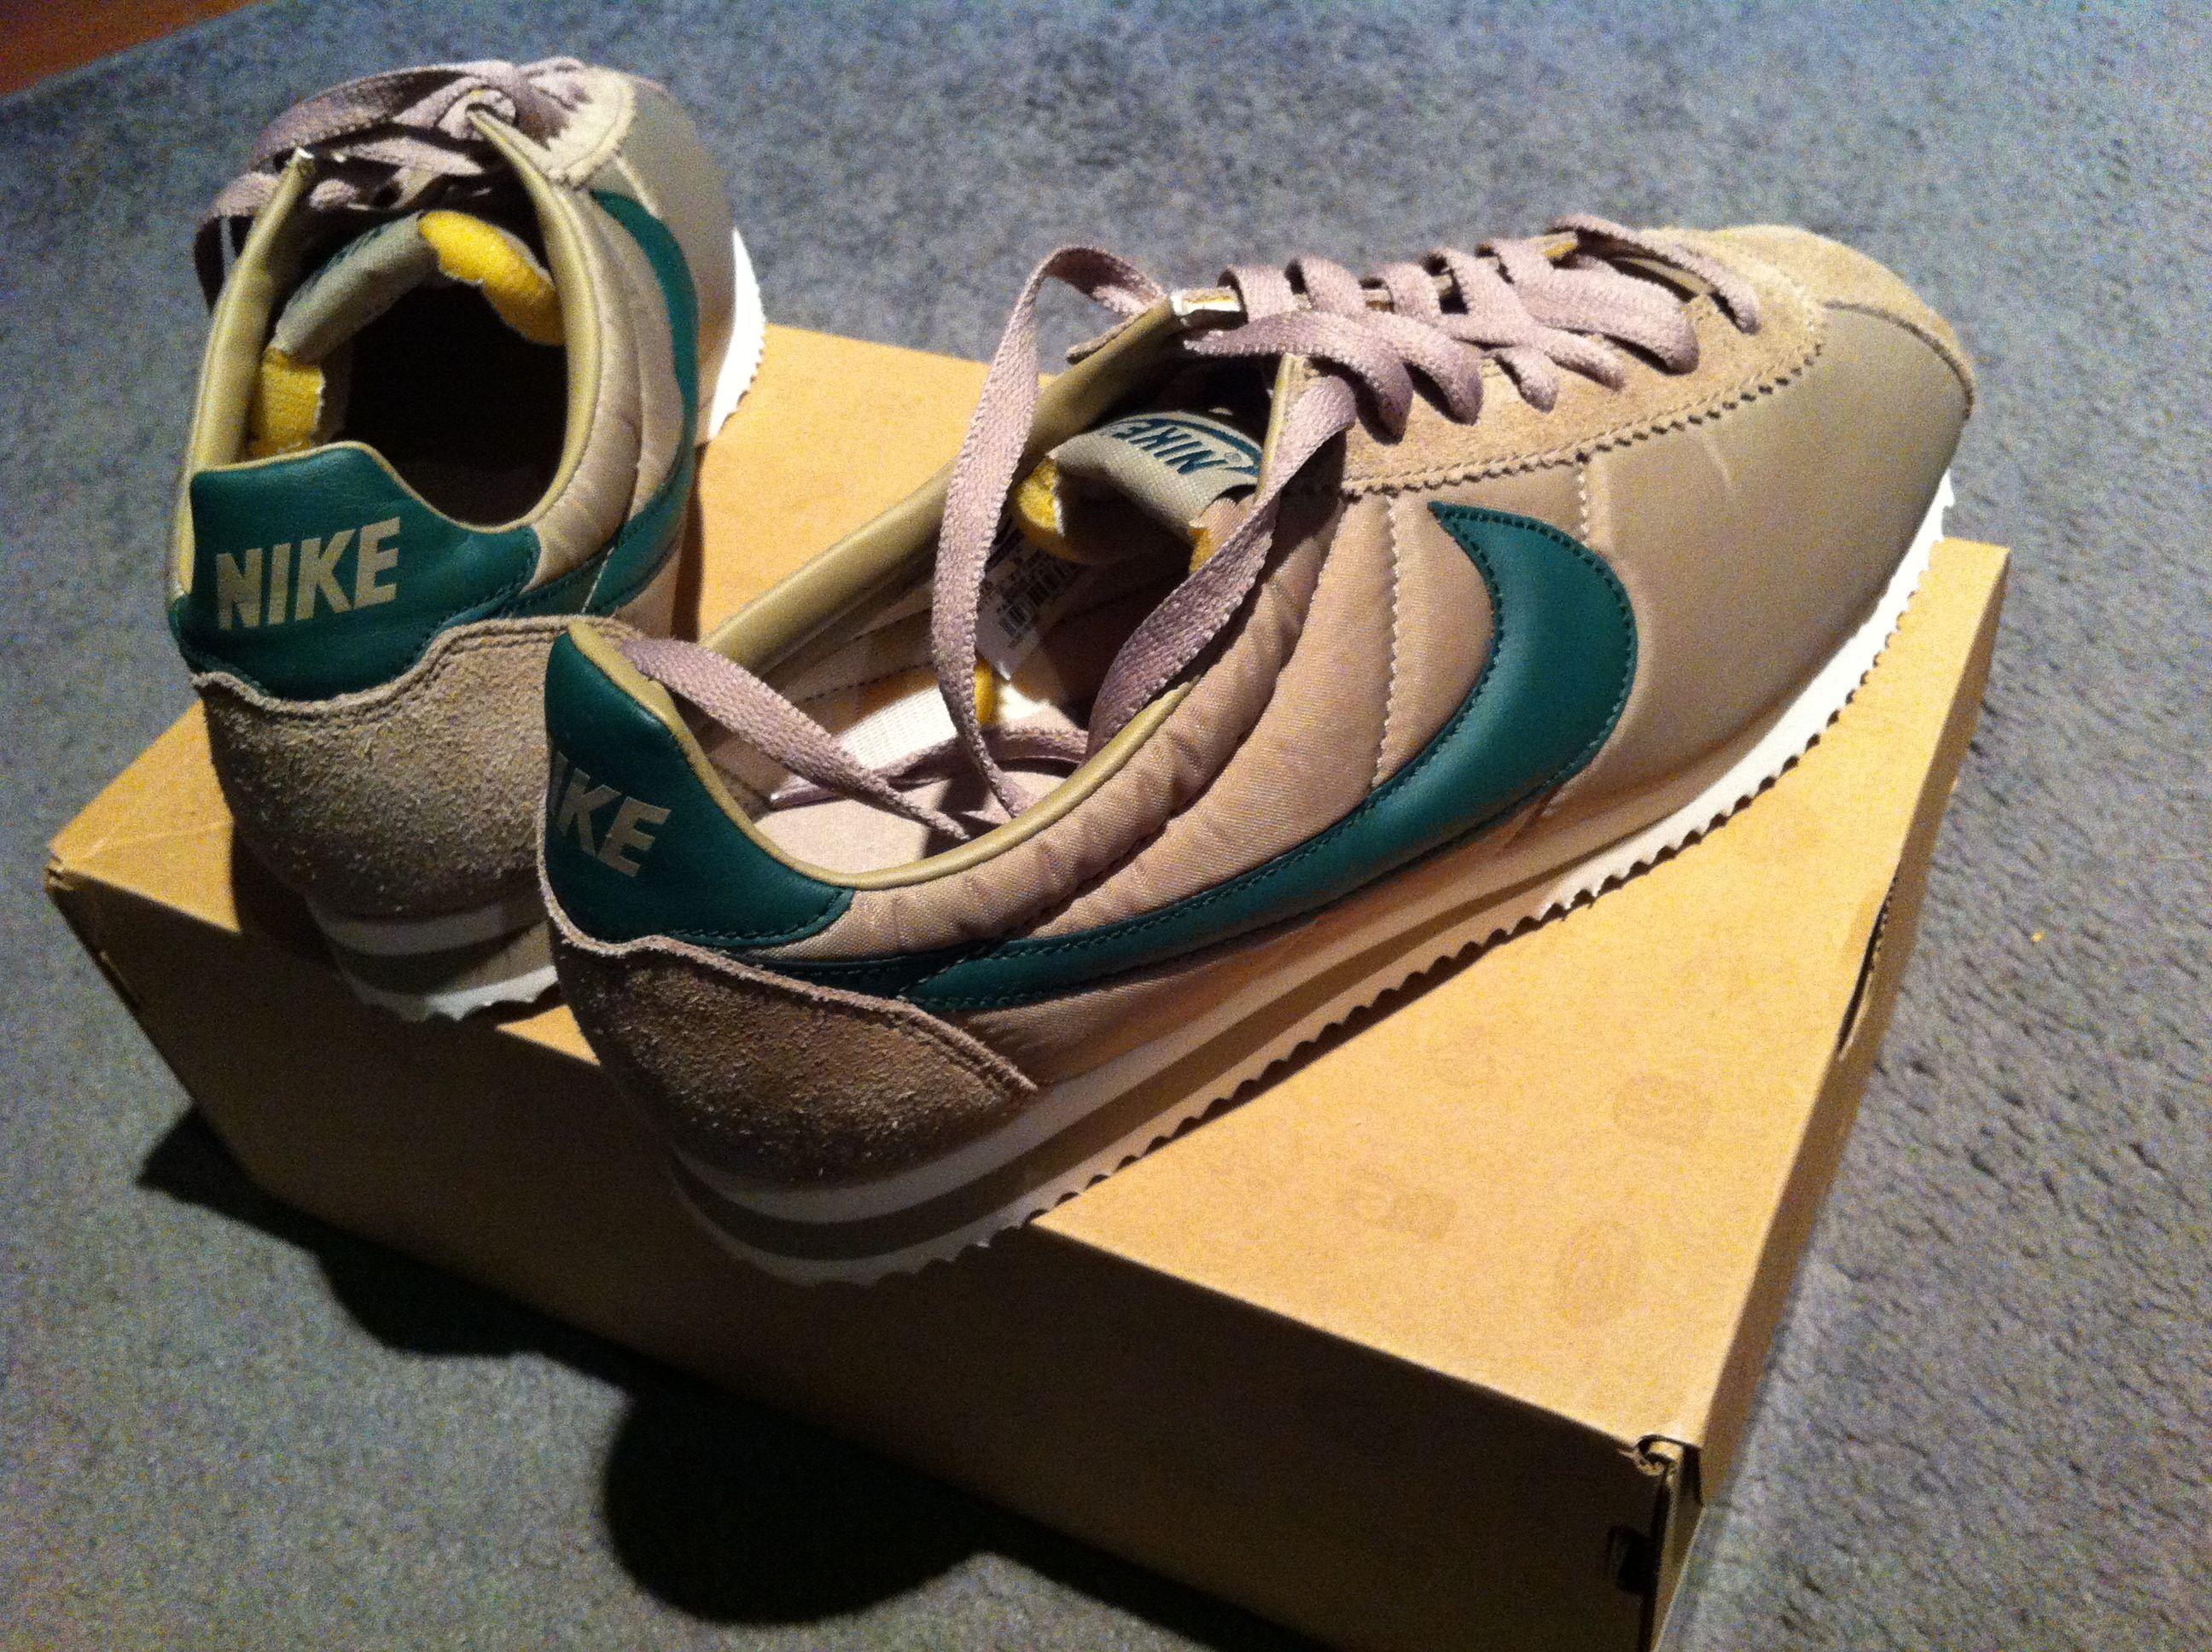 san francisco 42702 5c8c0 Nike Classic Cortez VNTG khaki george green-sail - found their home  -)